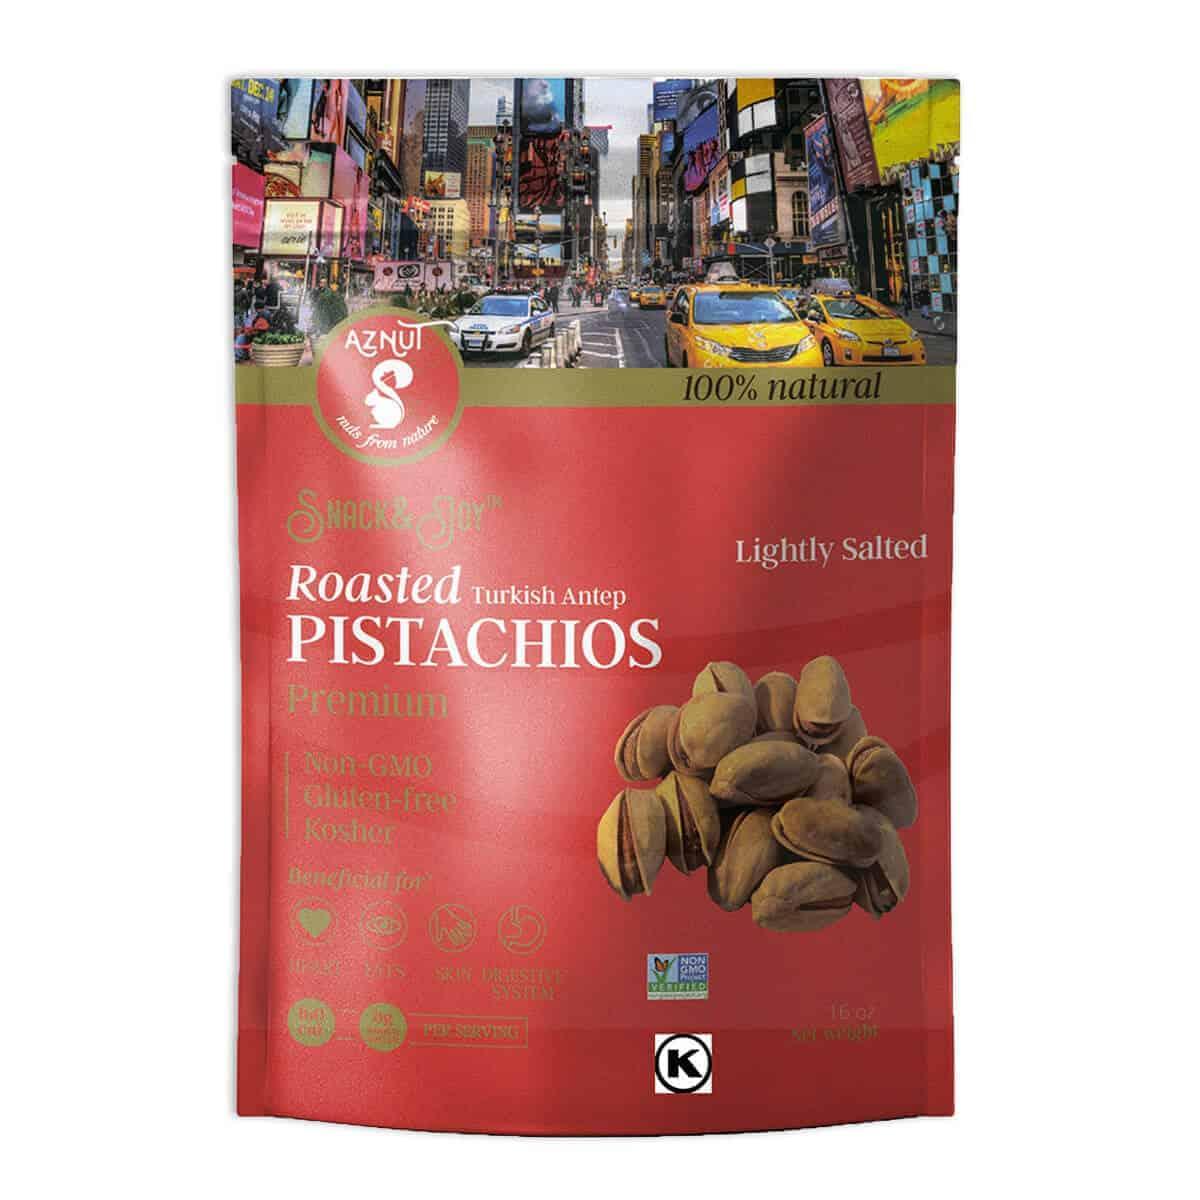 Pistachos Turcos Tostados, Aznut Roasted Salted Turkish Antep Pistachio, 16 OZ